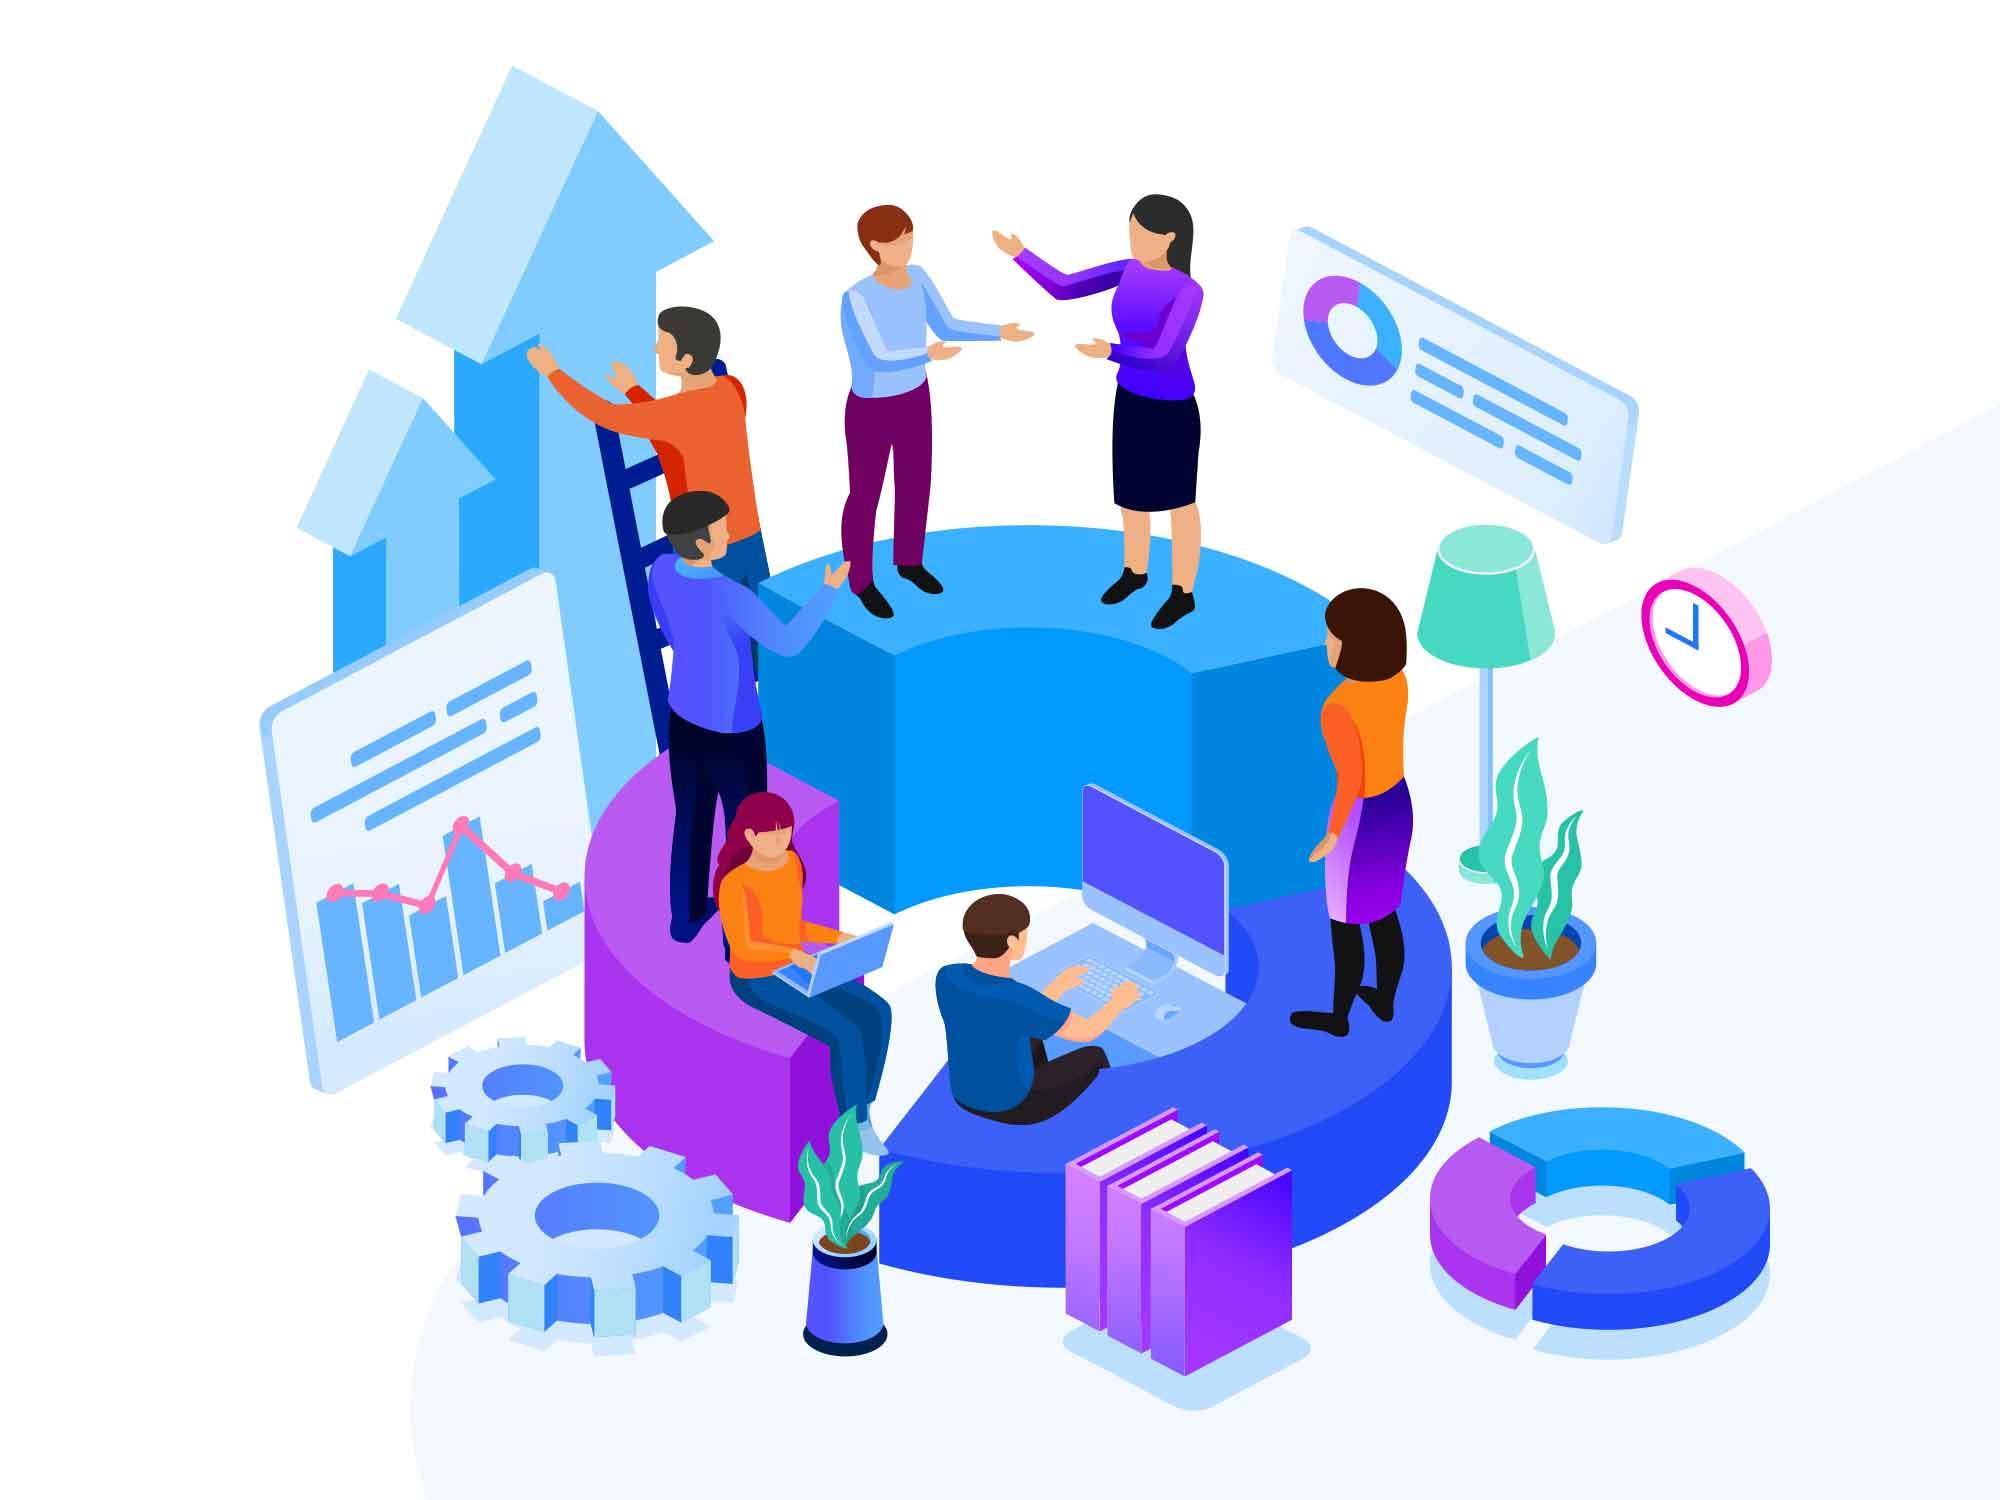 Business Team Building Illustration